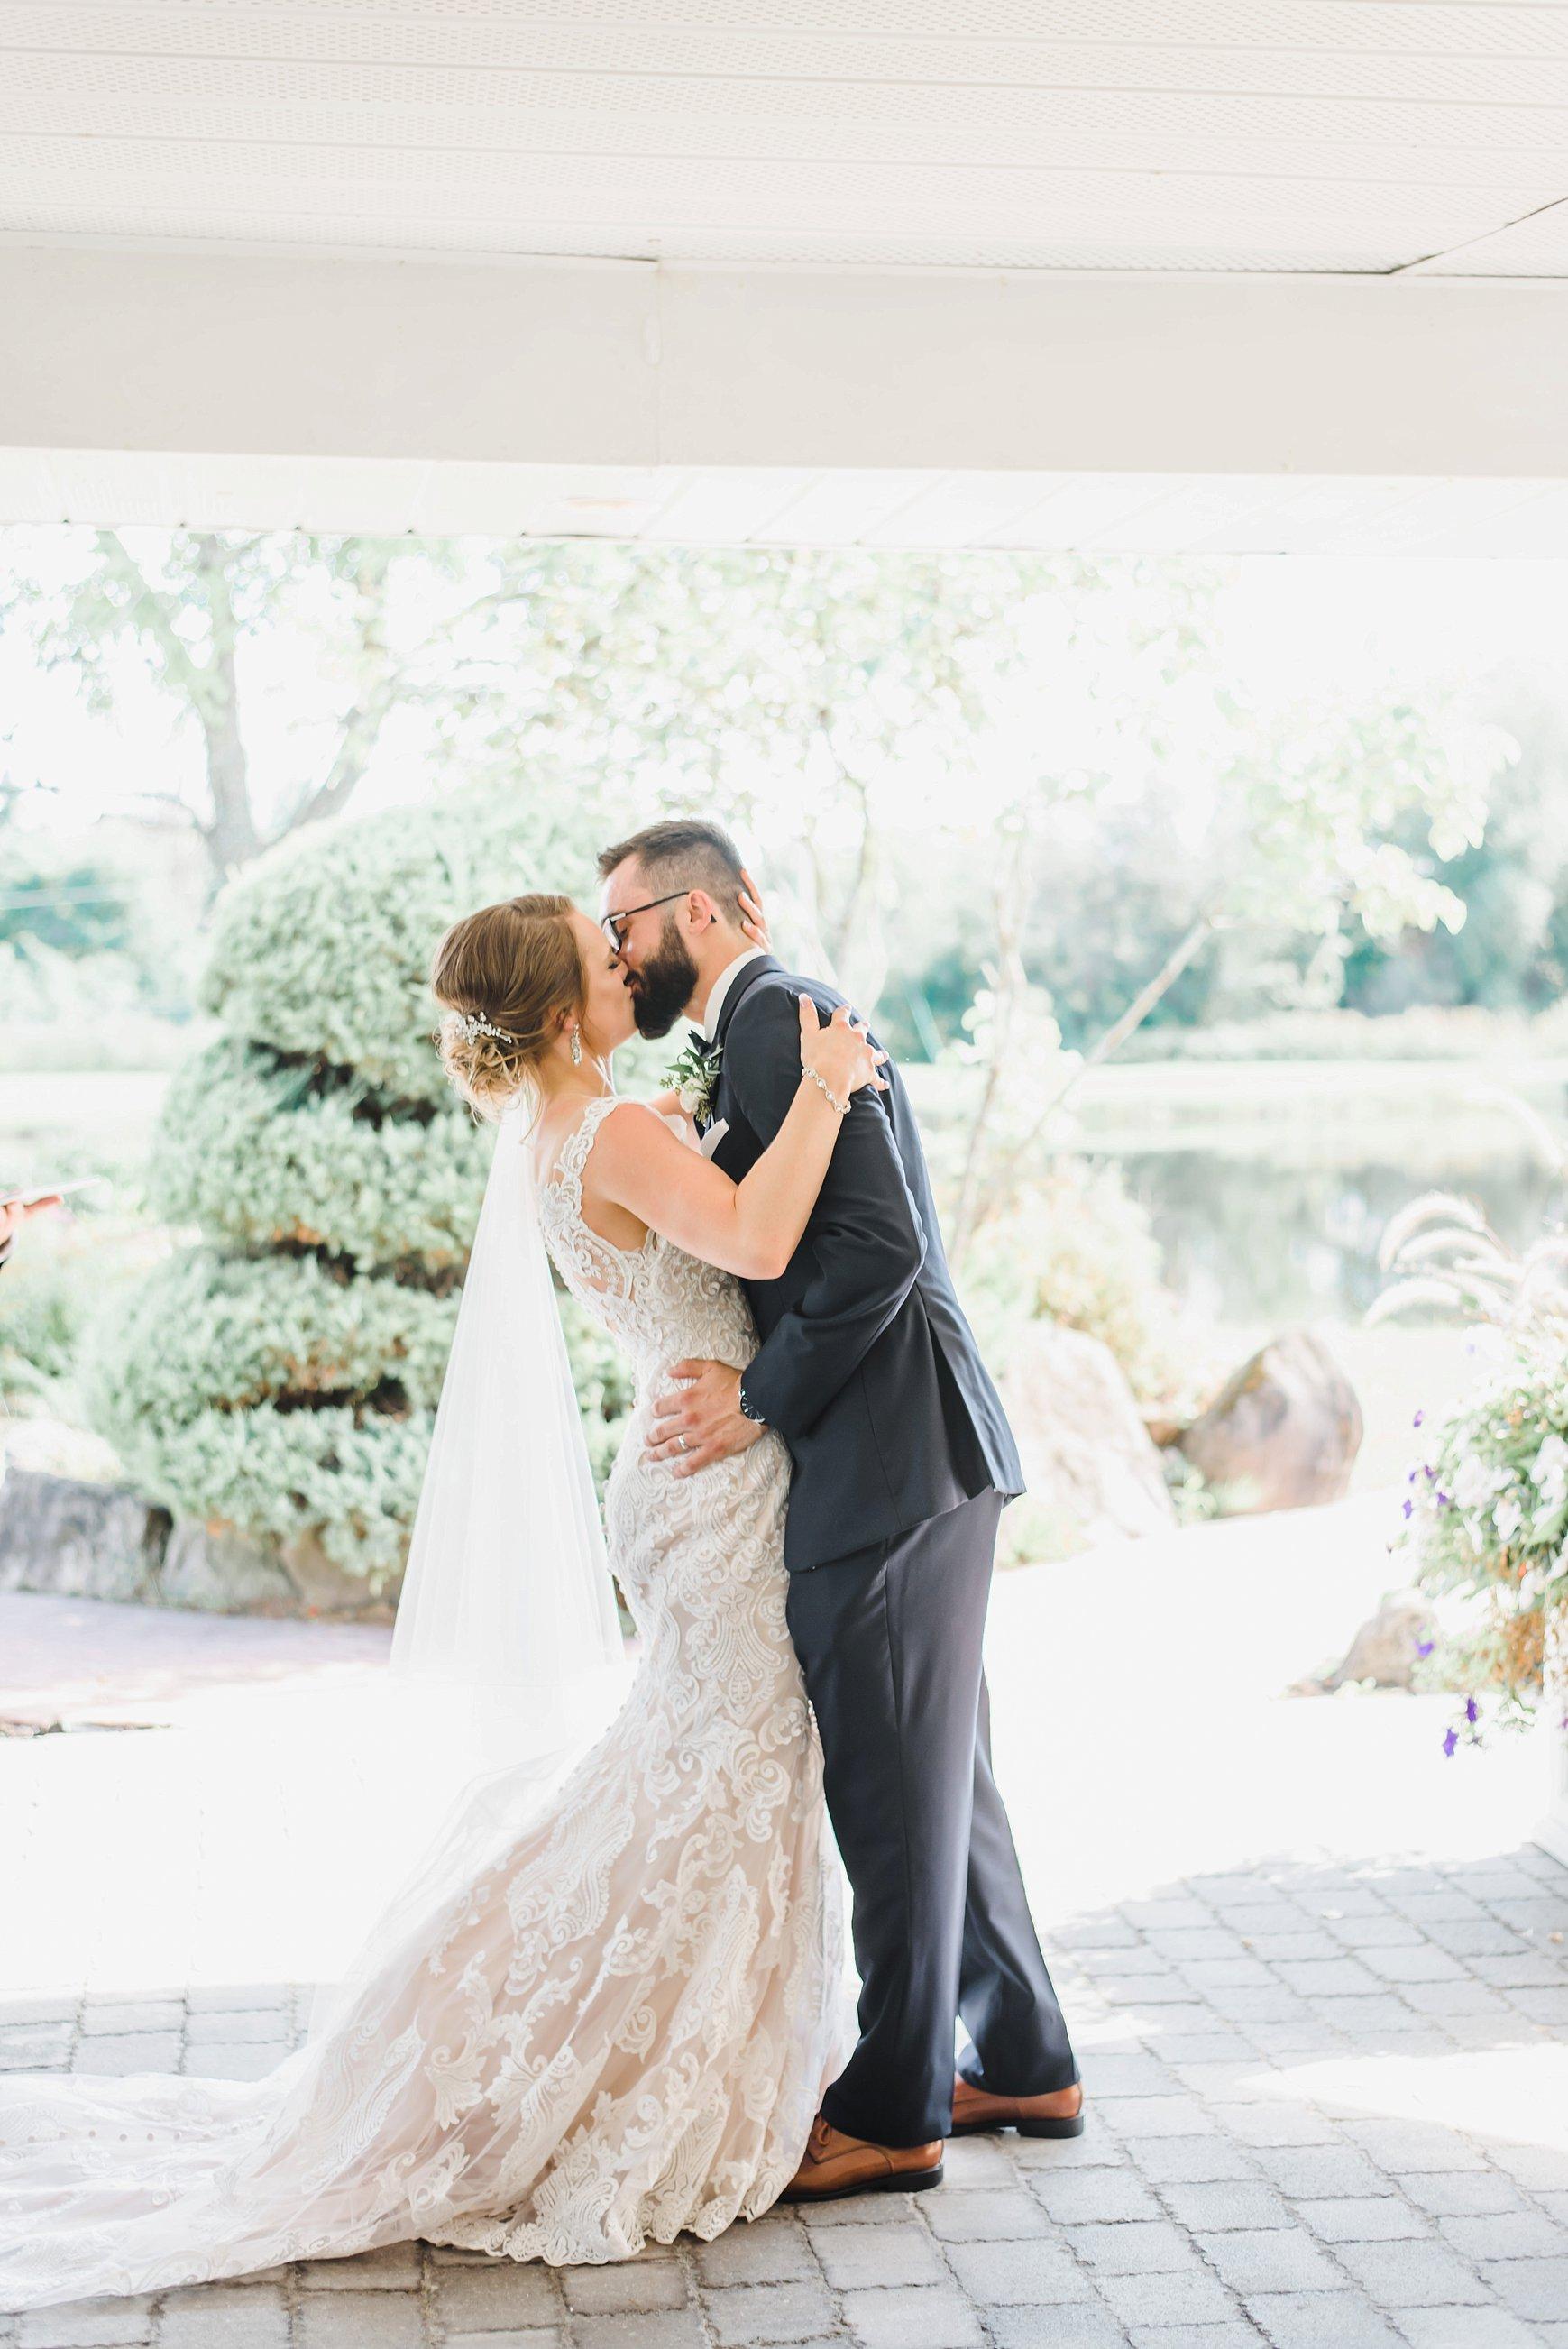 light airy indie fine art ottawa wedding photographer | Ali and Batoul Photography_1278.jpg